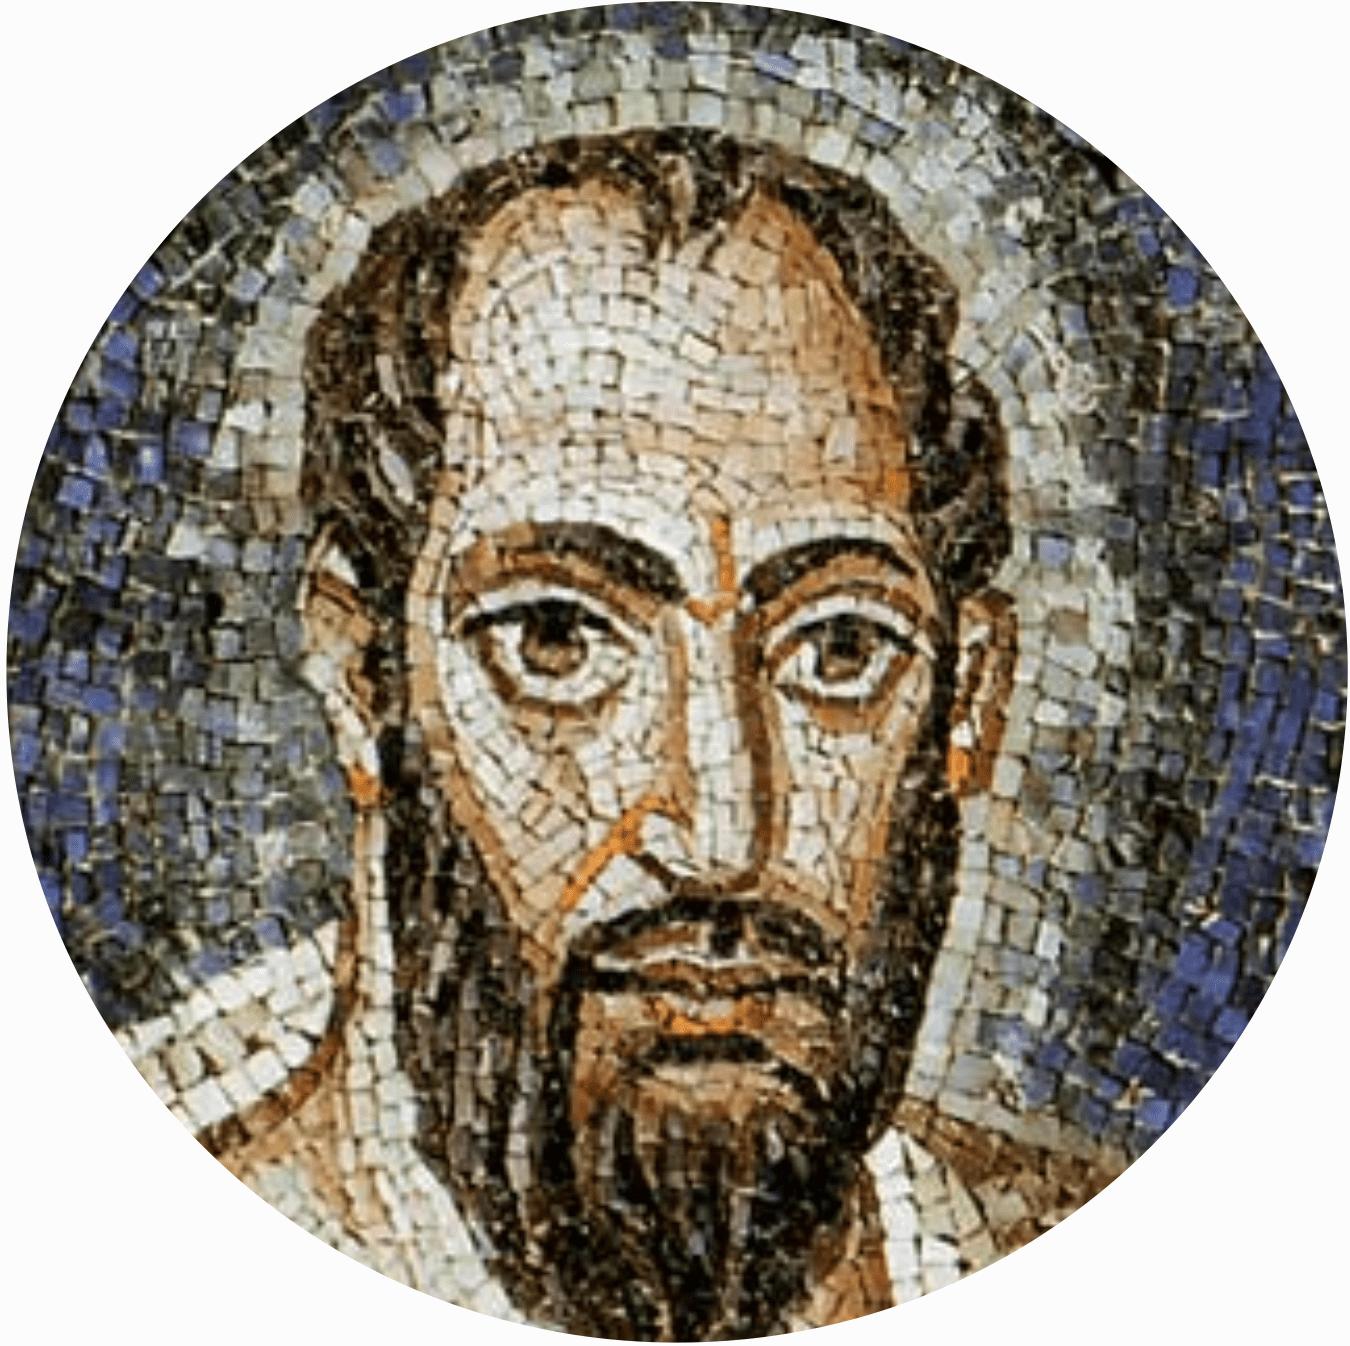 Pastor Laico | Blog